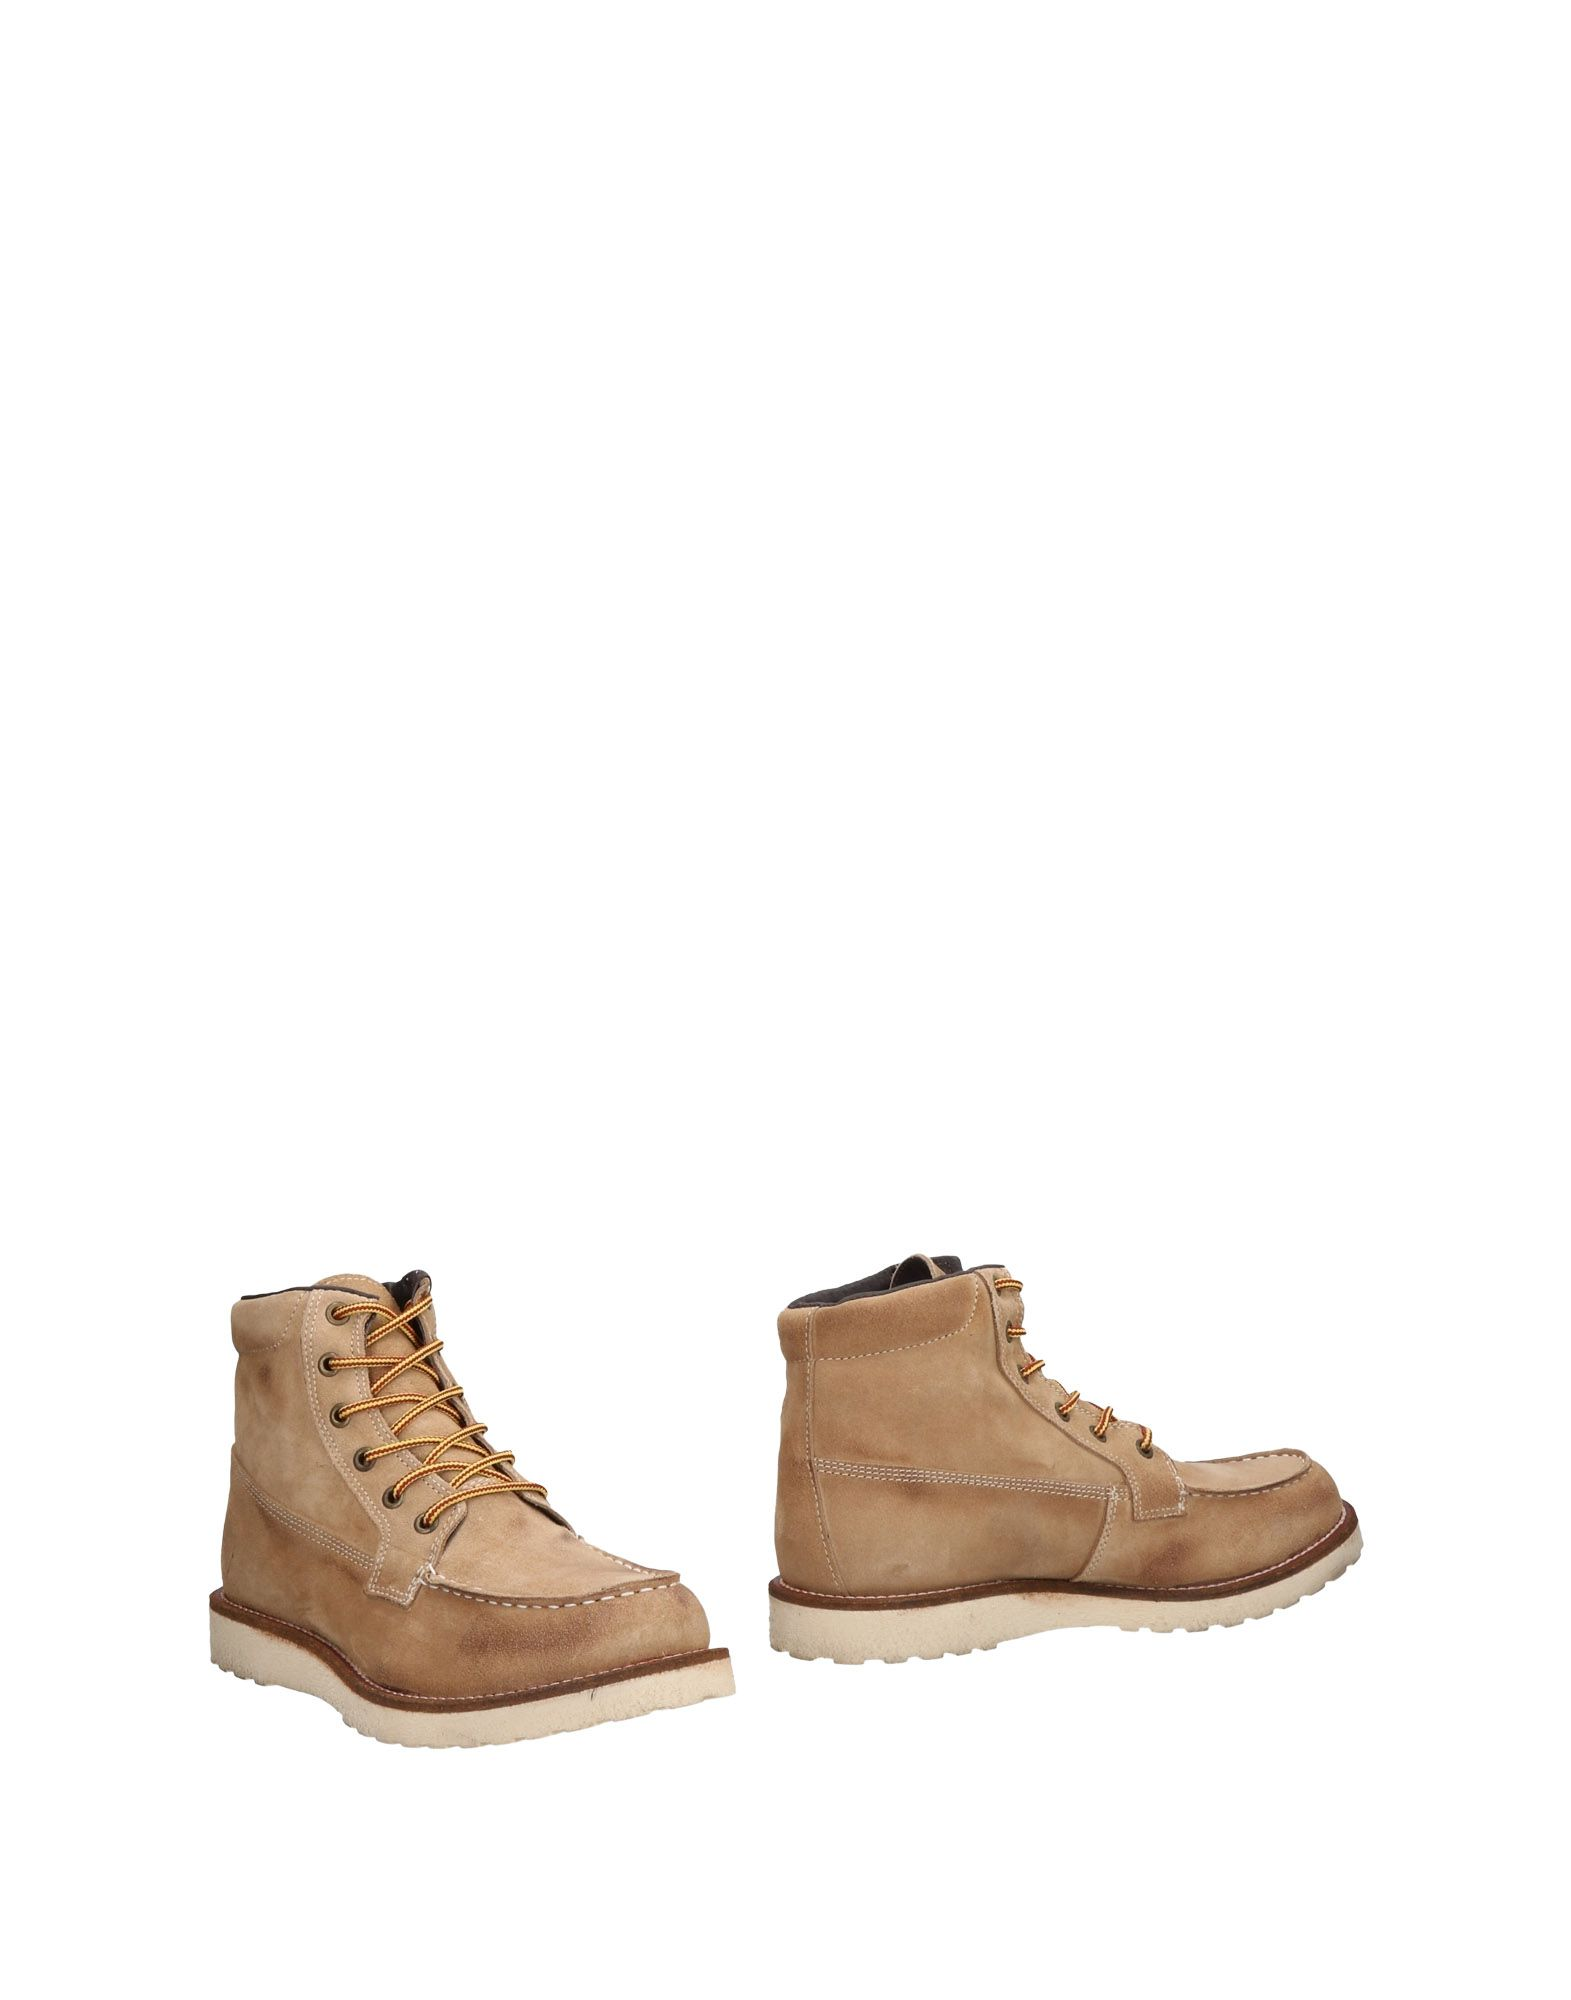 Haltbare Mode billige Schuhe Selected Stiefelette Herren  11468753AI Heiße Schuhe